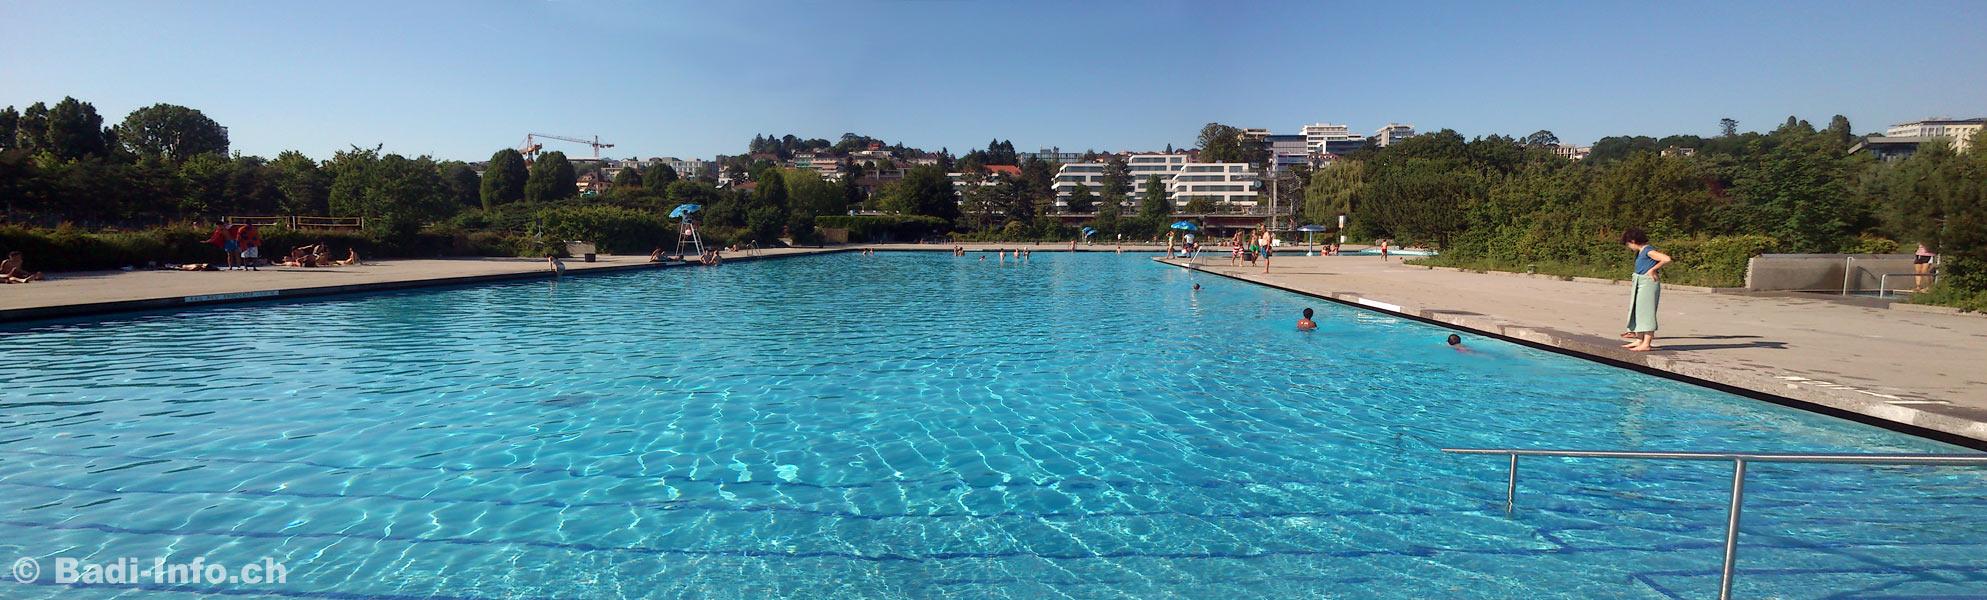 Piscine bellerive plage lausanne bassin non nageurs for Piscine de jardin suisse